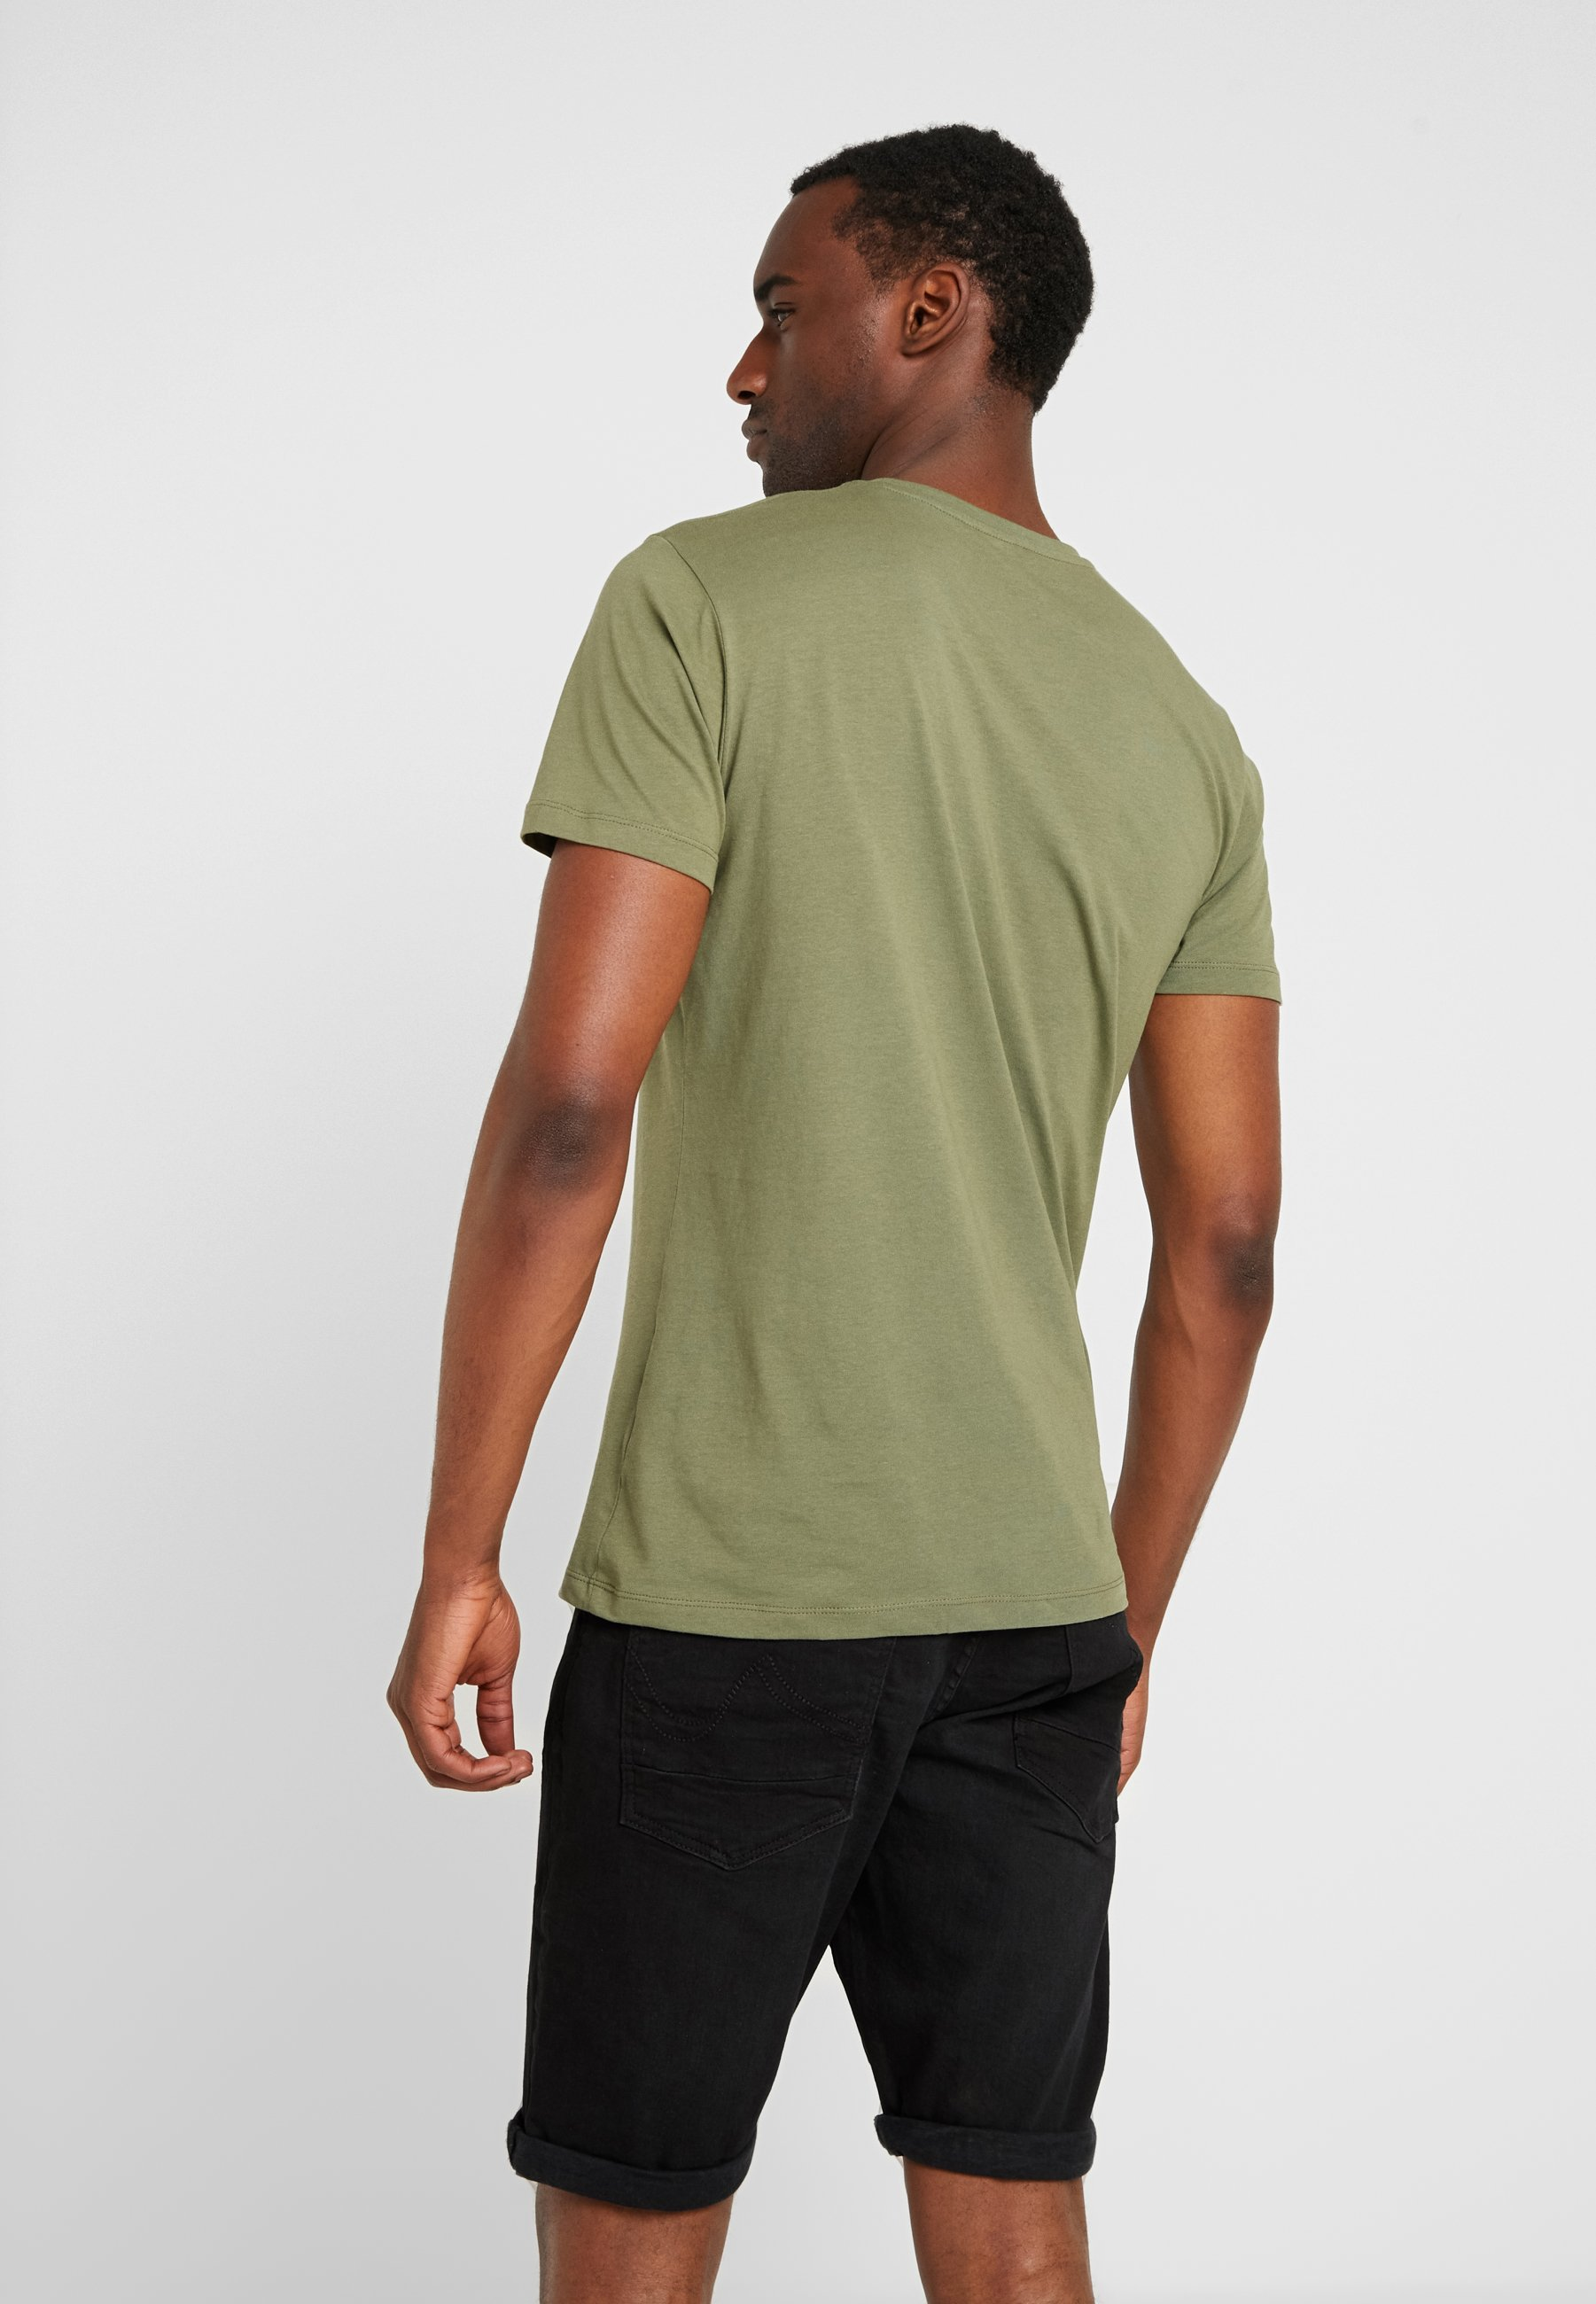 Icon 2 shirt PackT Imprimé Khaki Esprit Green OZTXiulwPk